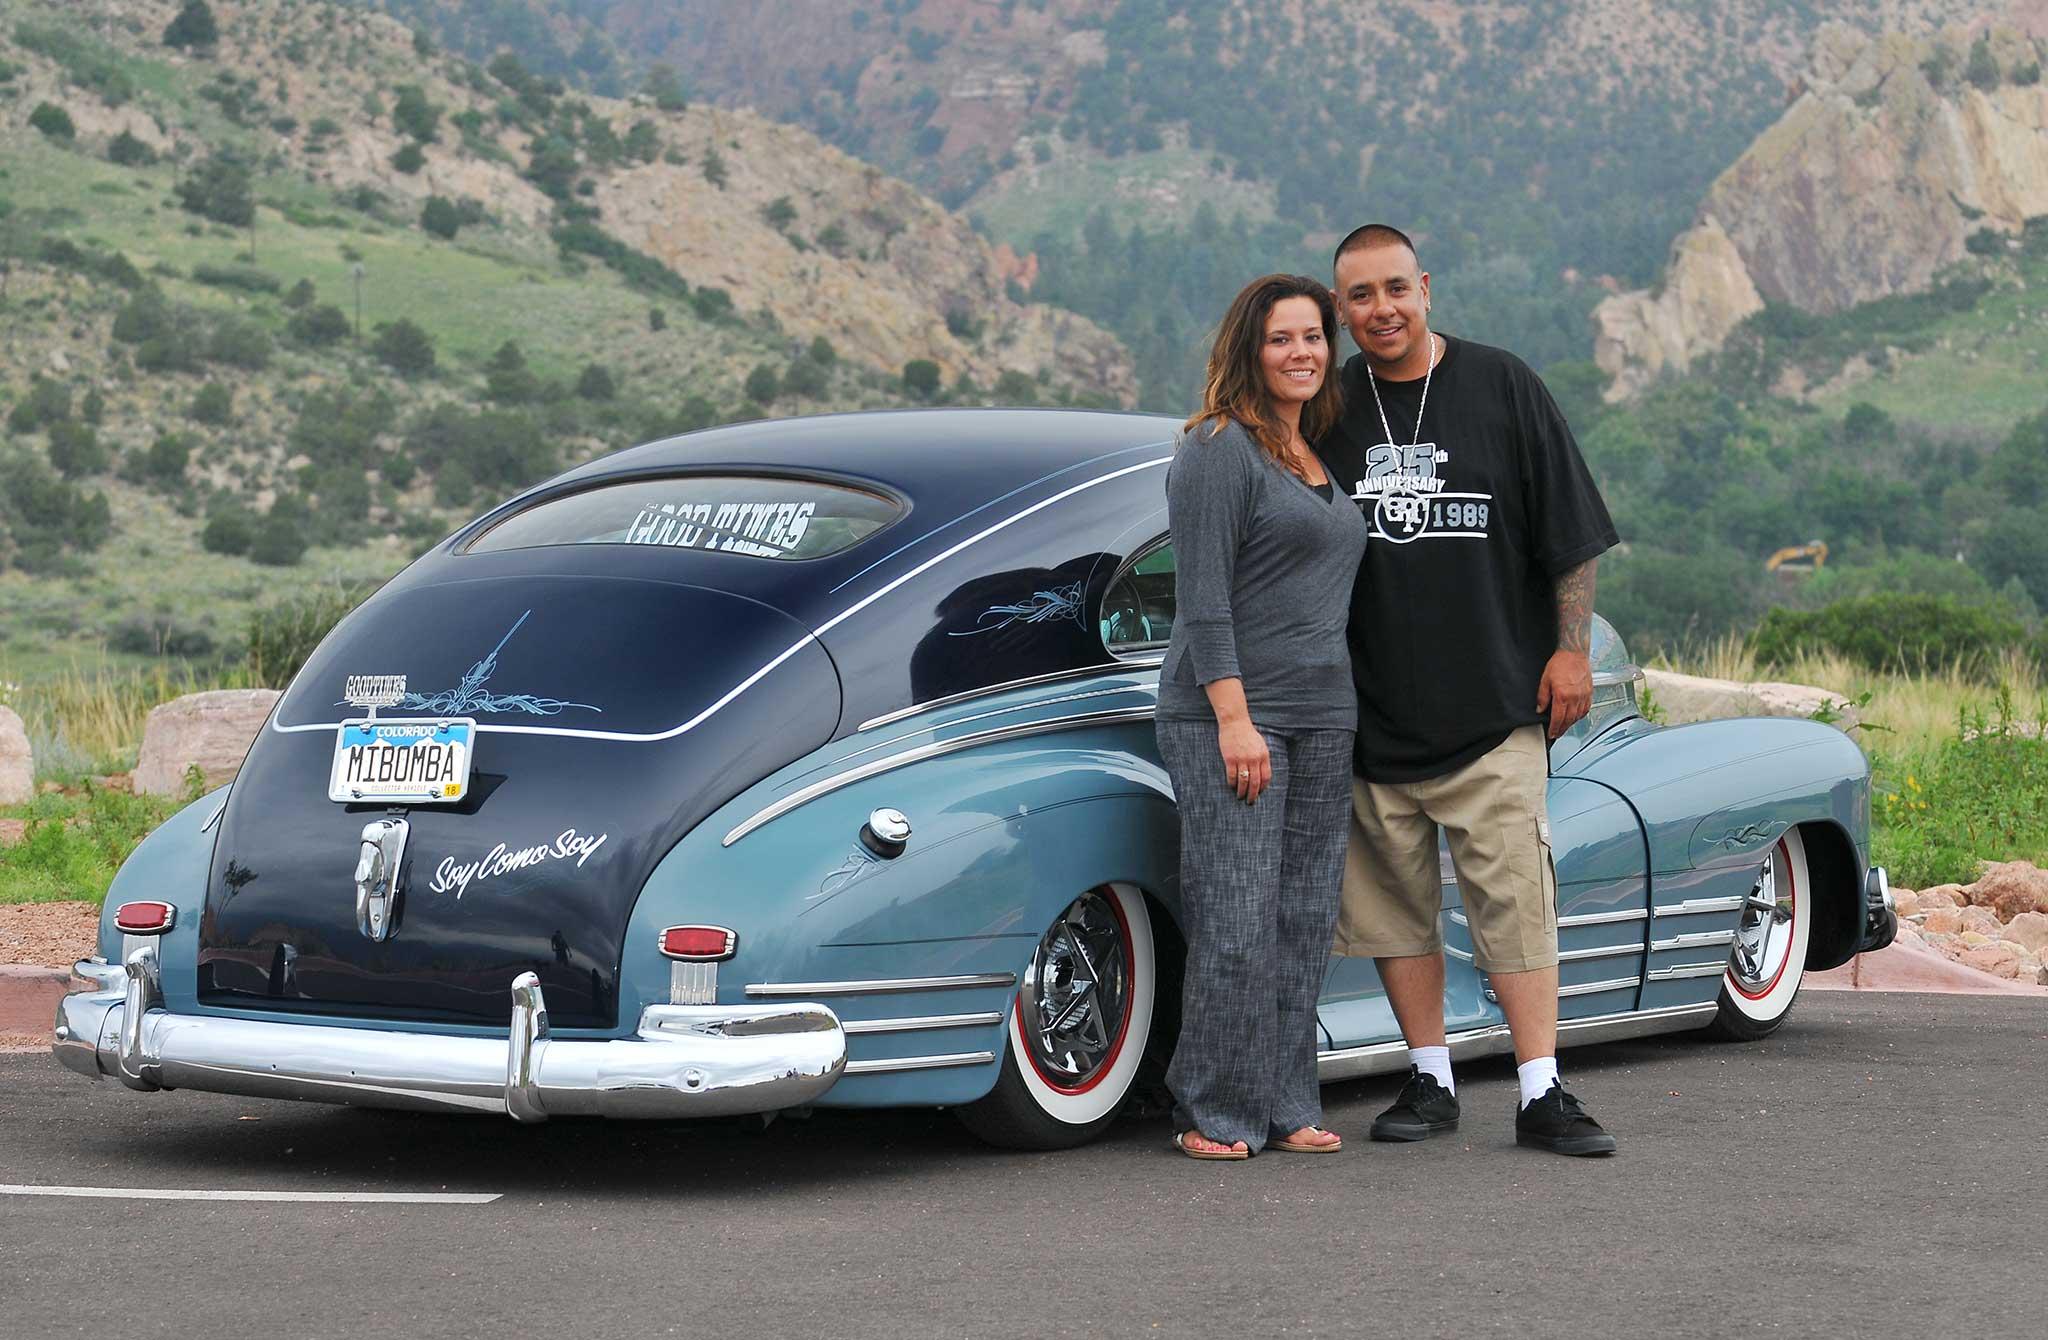 Chevrolet San Diego >> 1946 Chevrolet Fleetline - Let the Good Times Roll